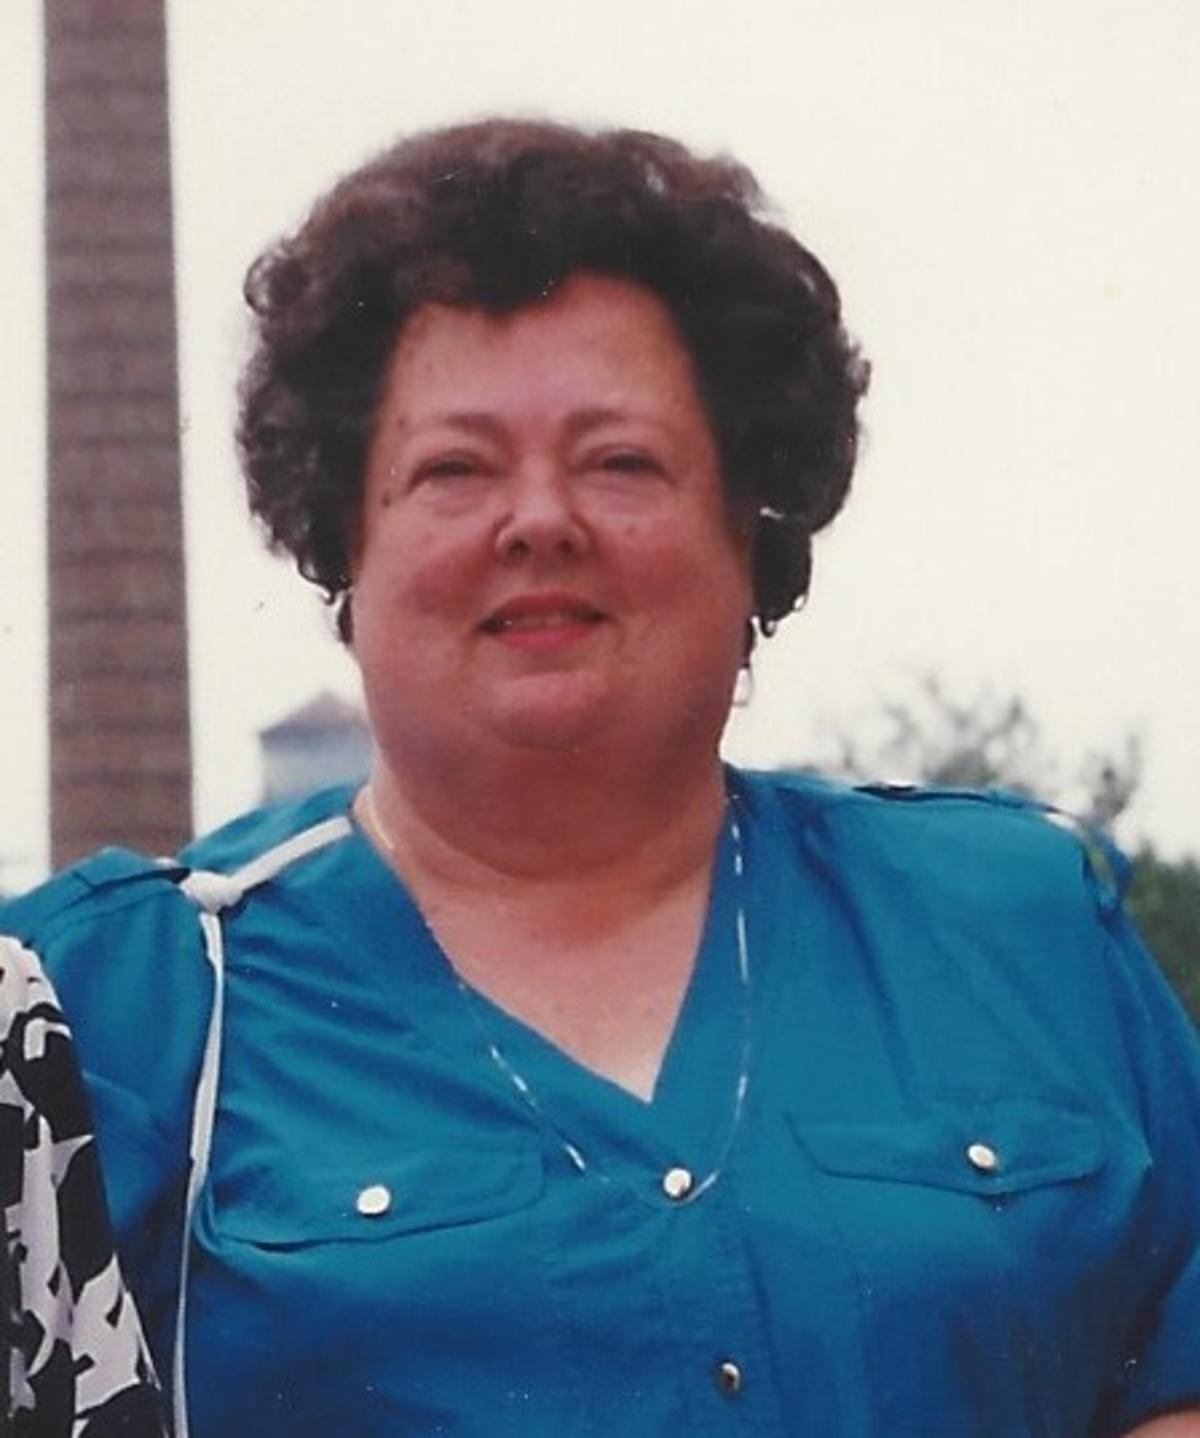 Barbara Gee Procise